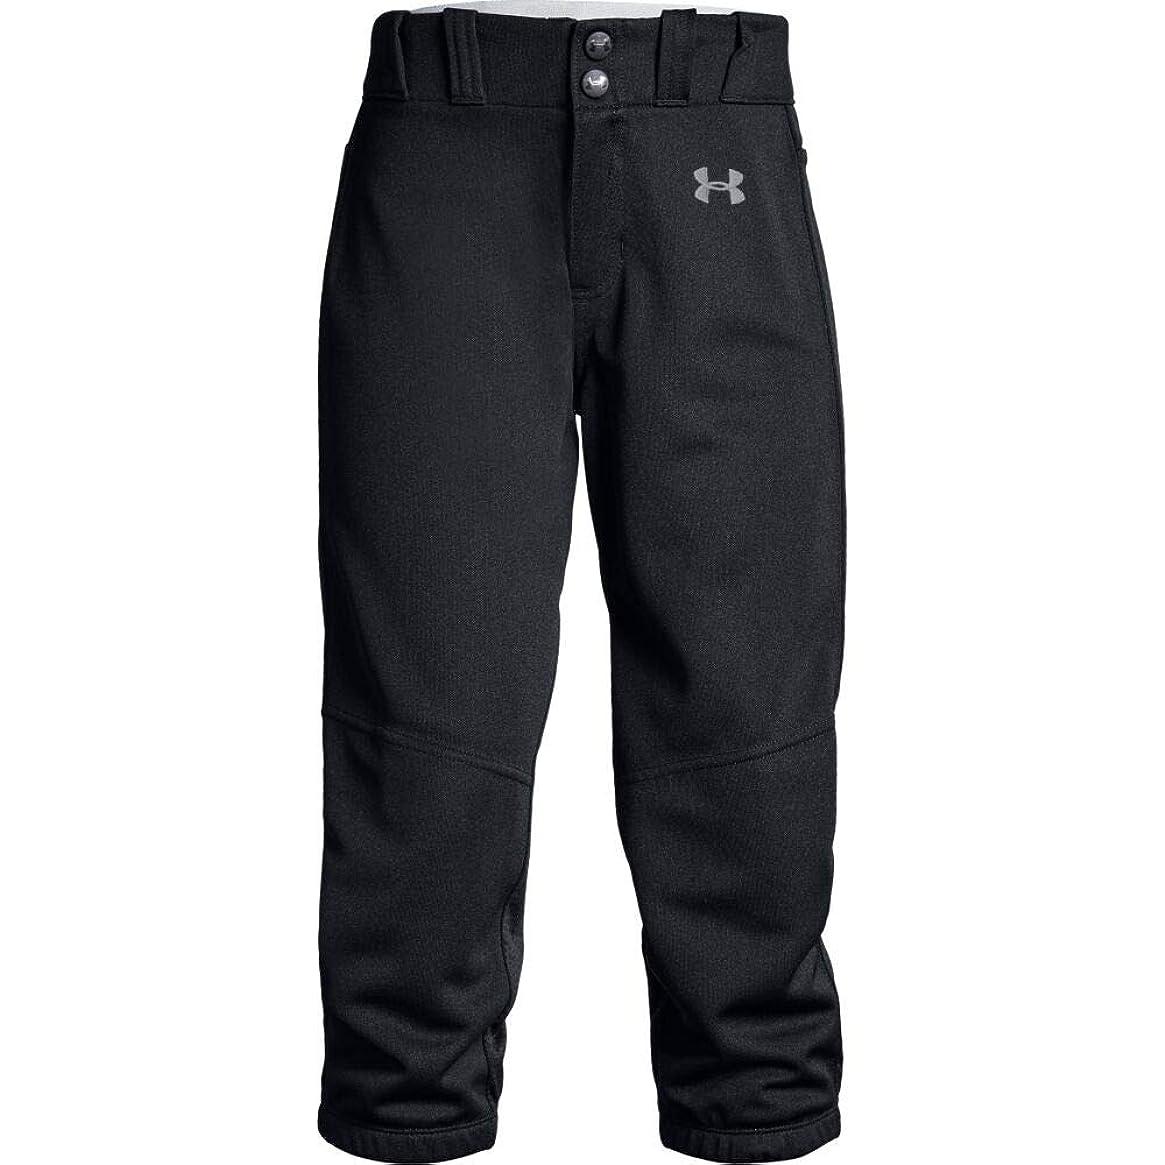 Under Armour Girls Softball Pants